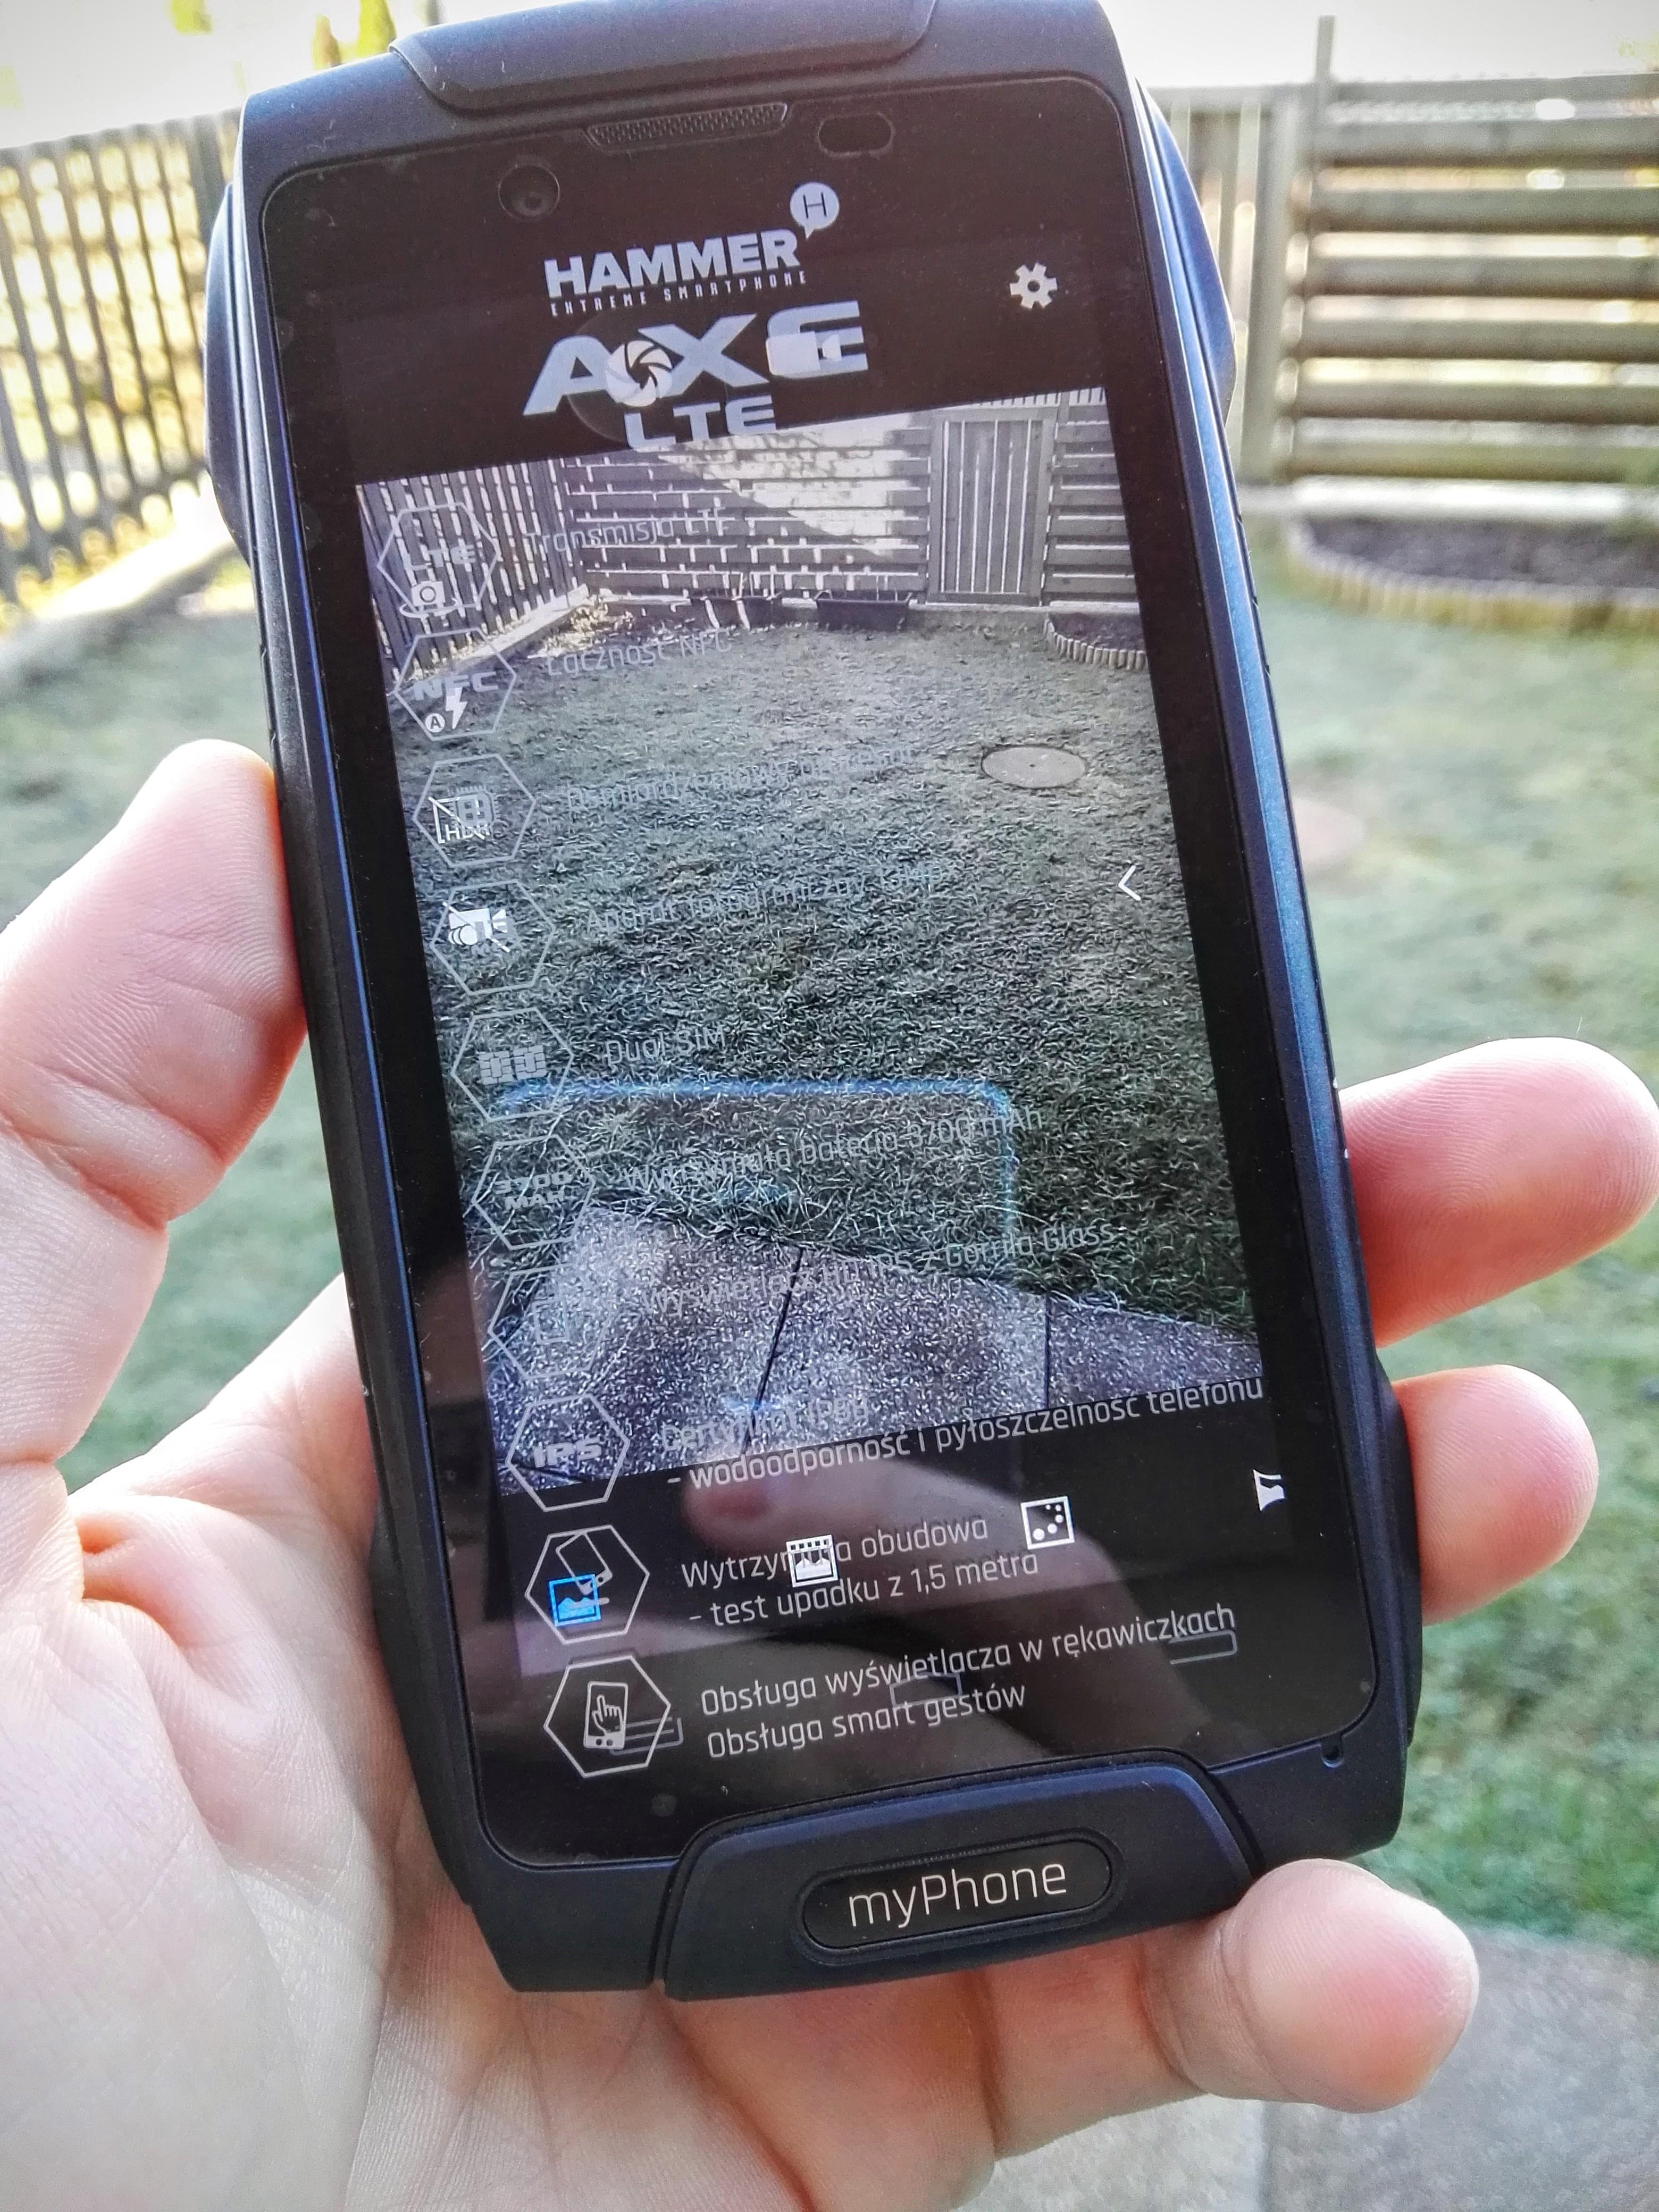 Myphone Hammer axe LTE